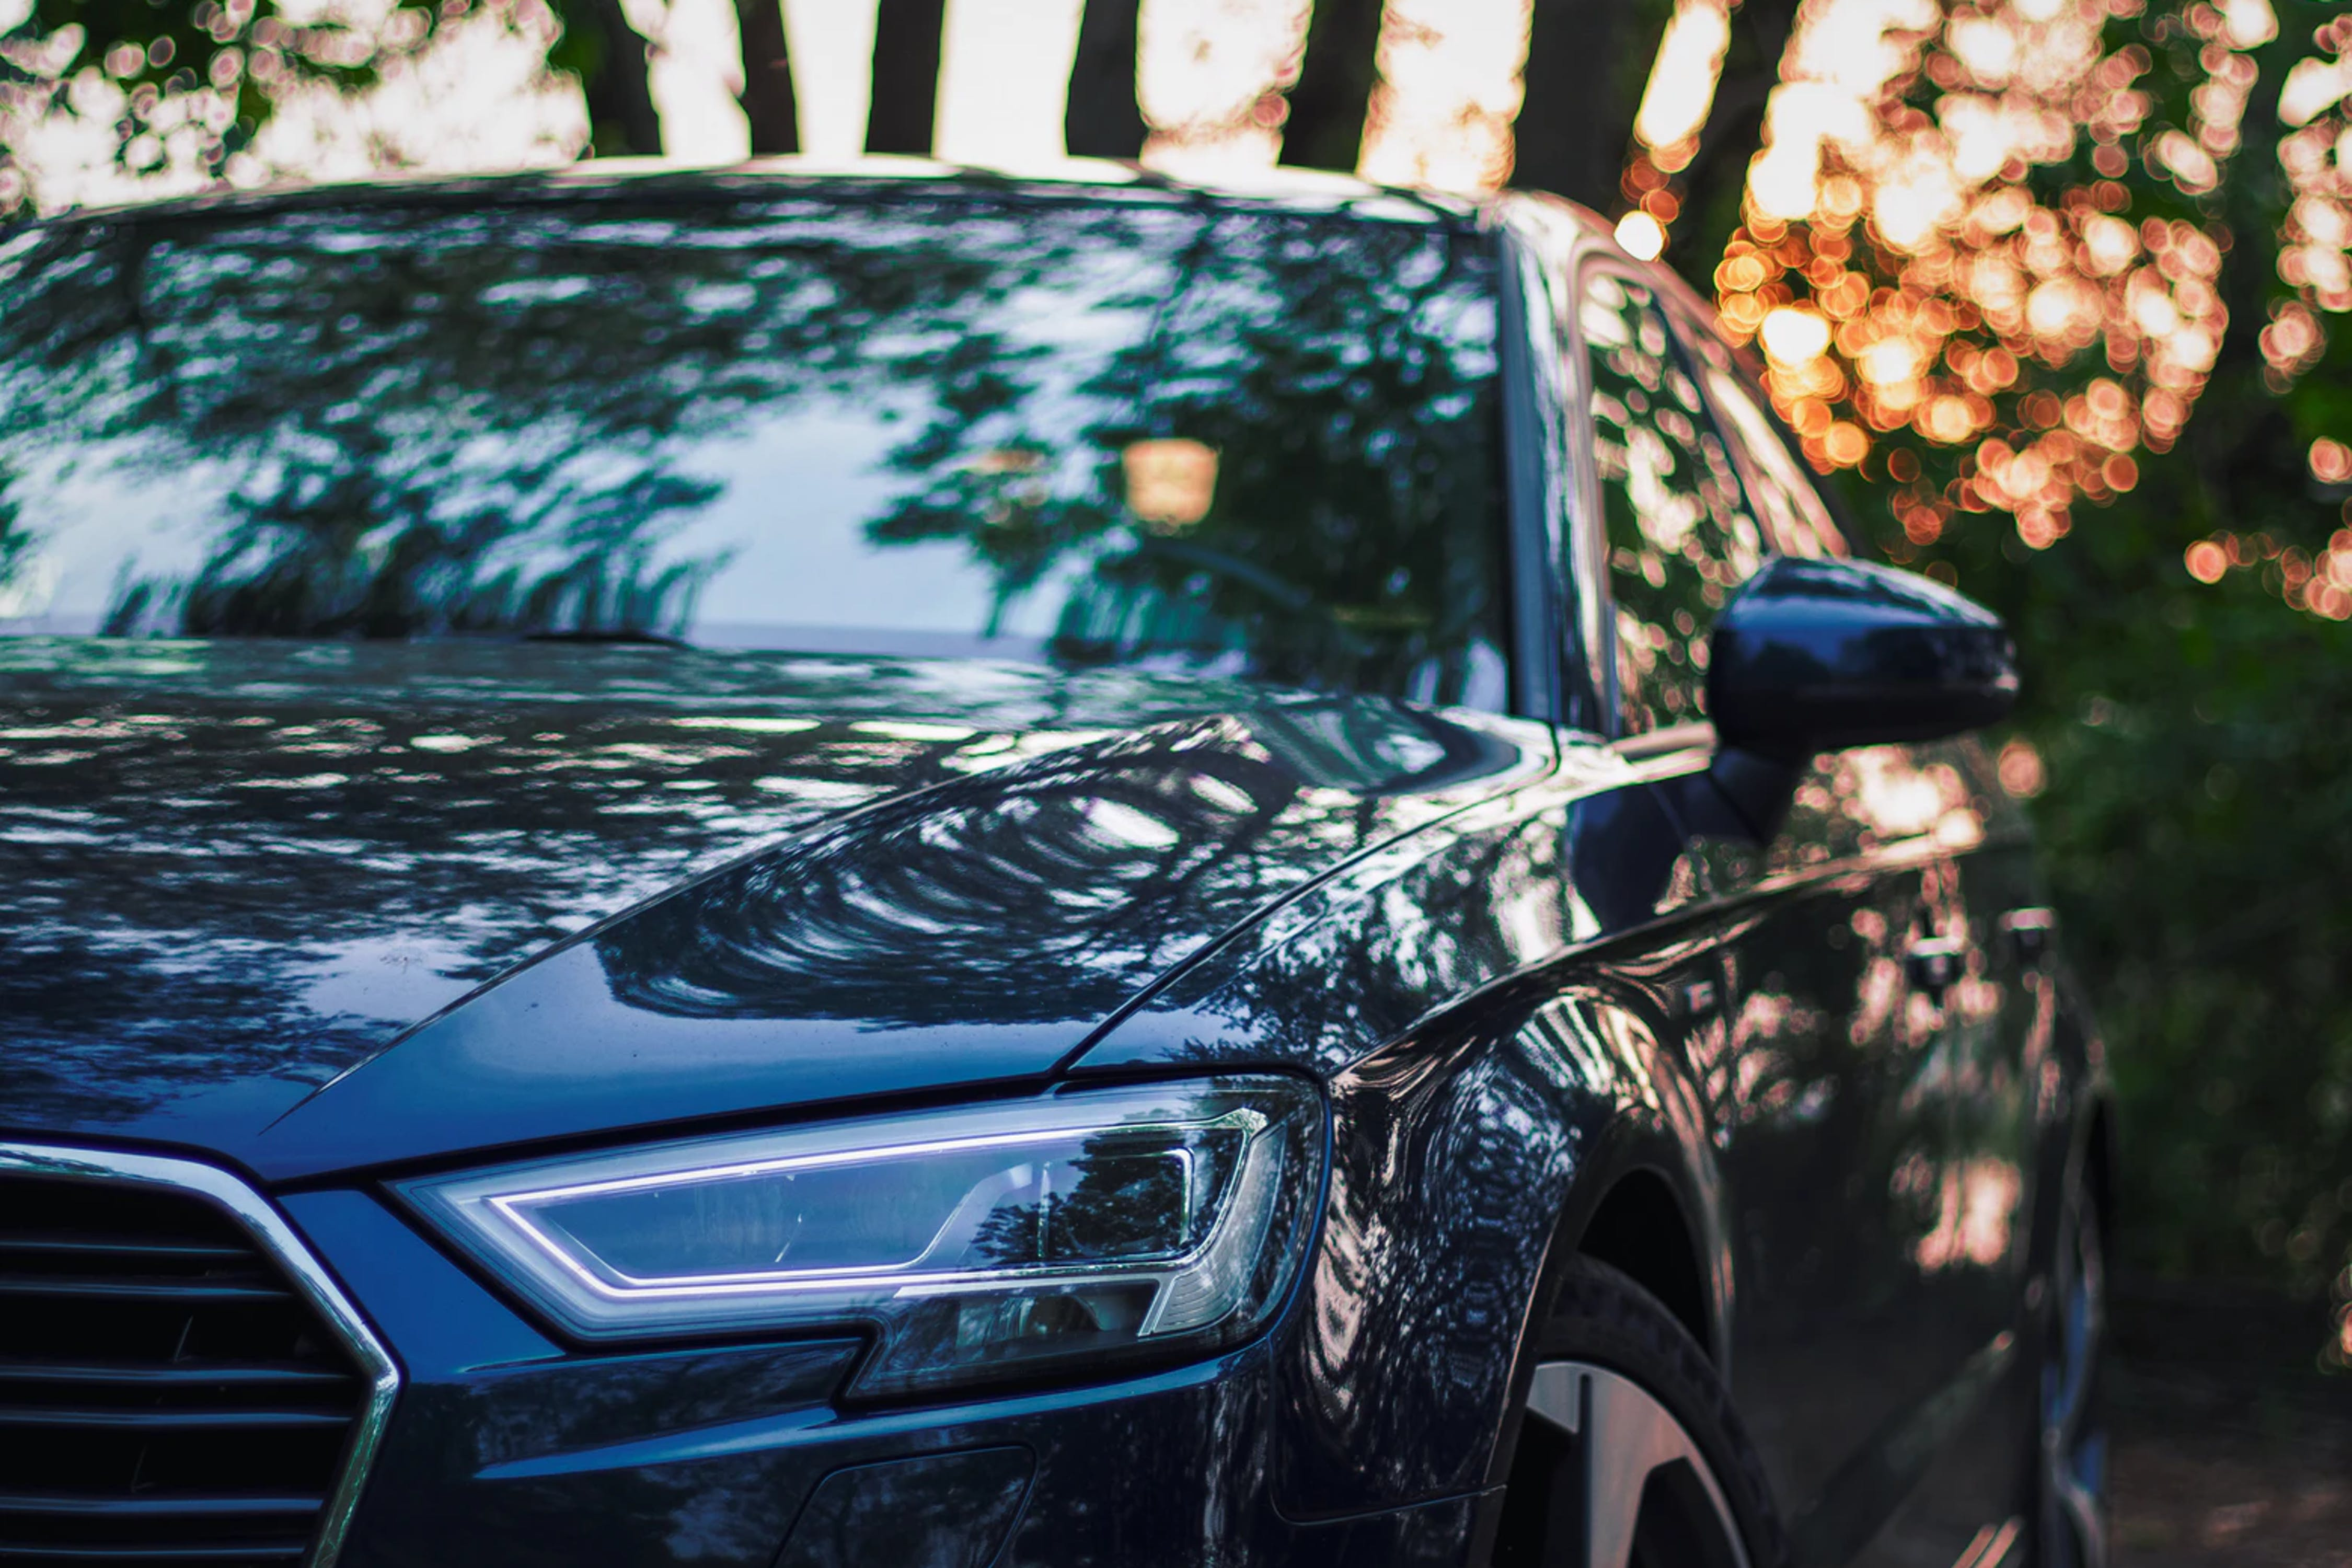 A black car stays under trees